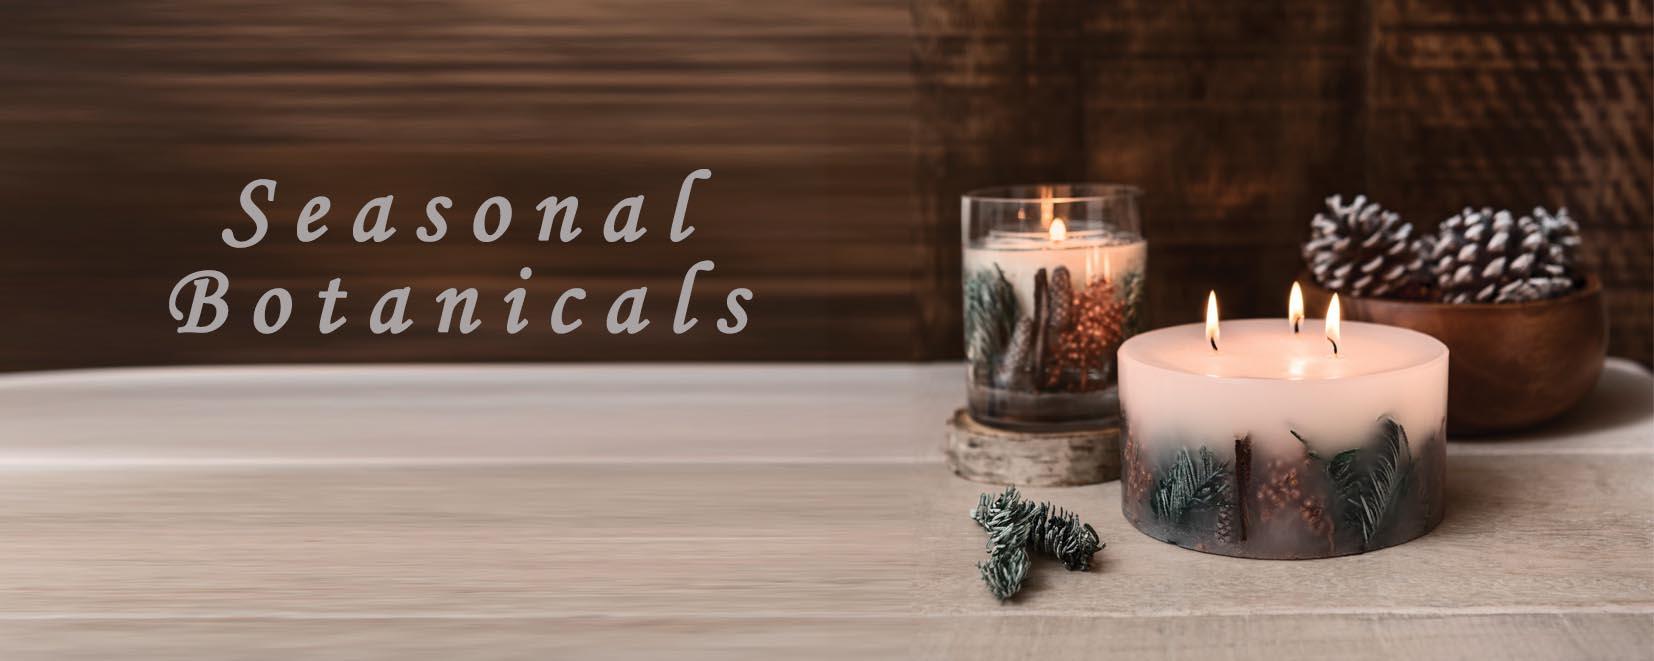 seasonal-botanicals-collection-header.jpg